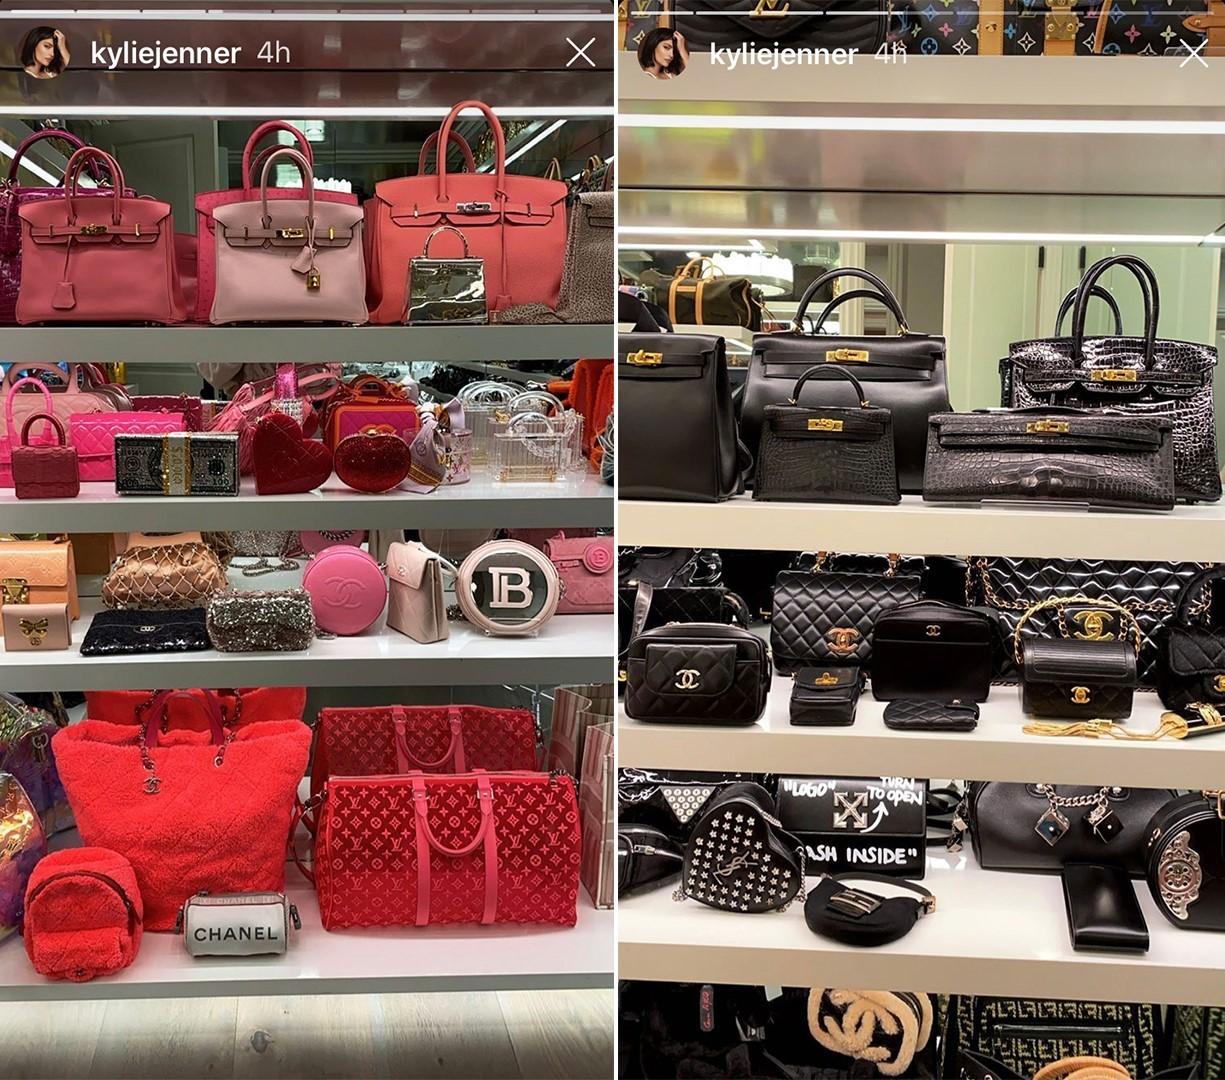 Imágenes del vestidor de Kylie Jenner